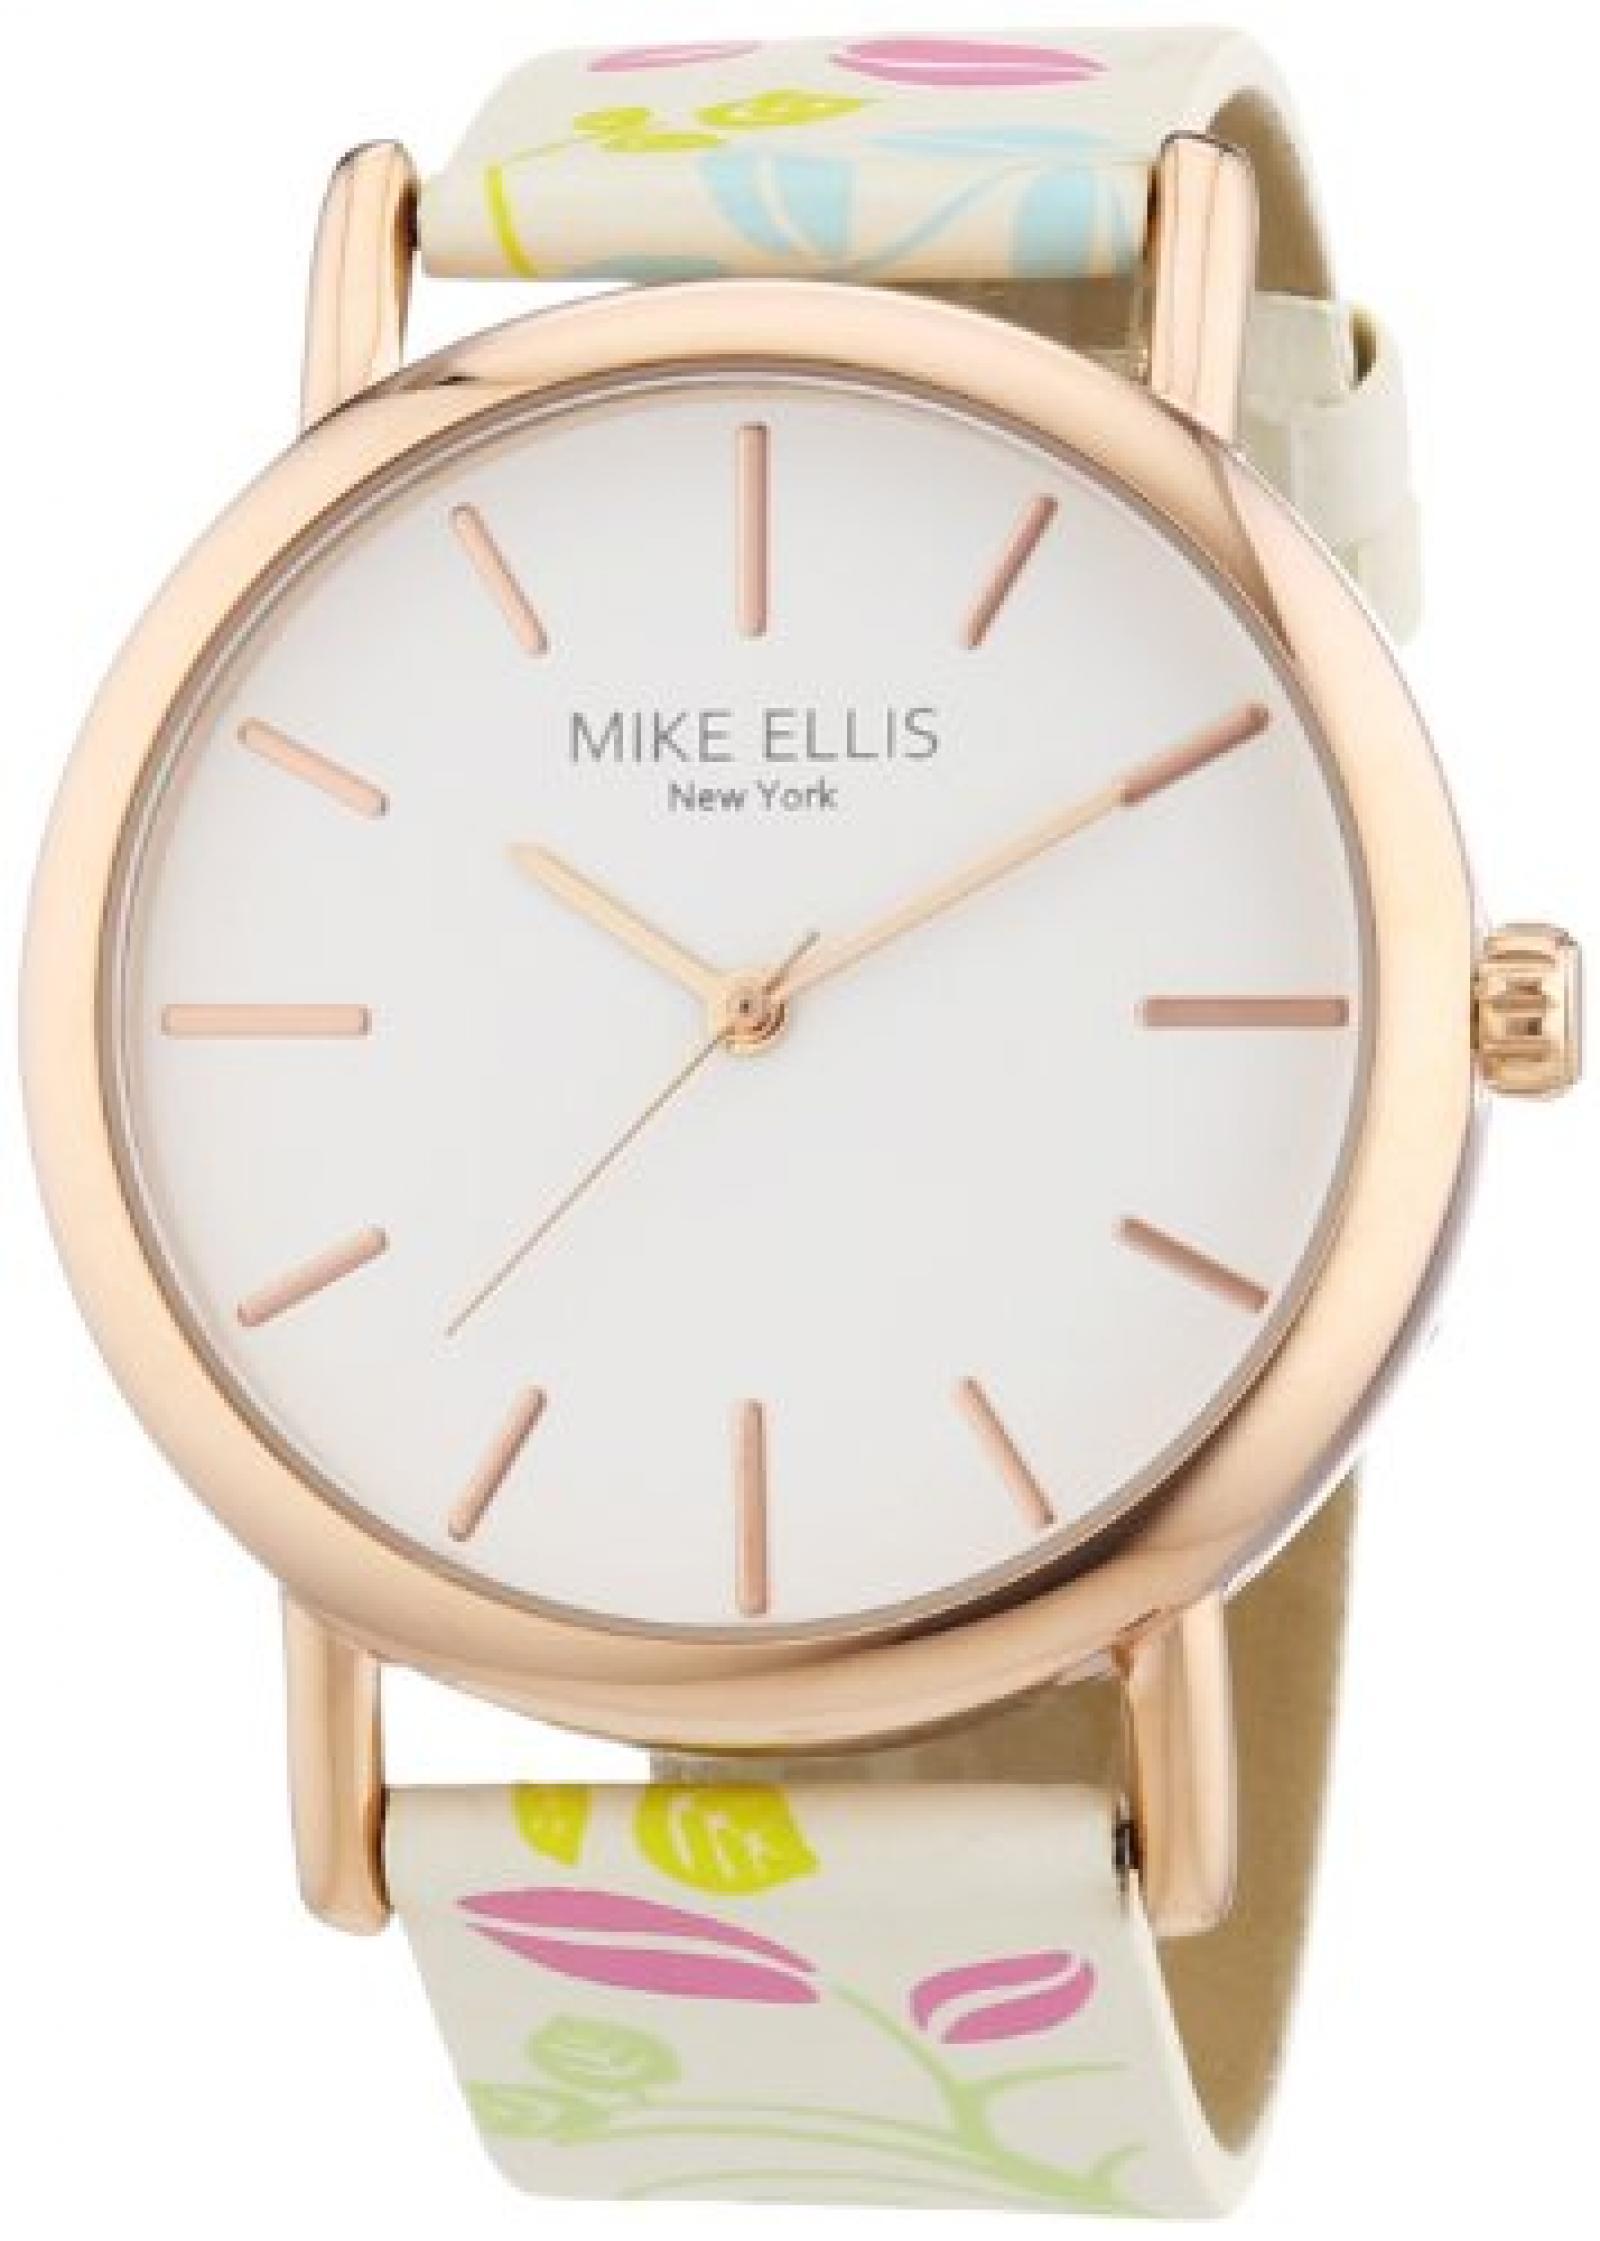 Mike Ellis New York Damen-Armbanduhr Analog Quarz Kunstleder L2979